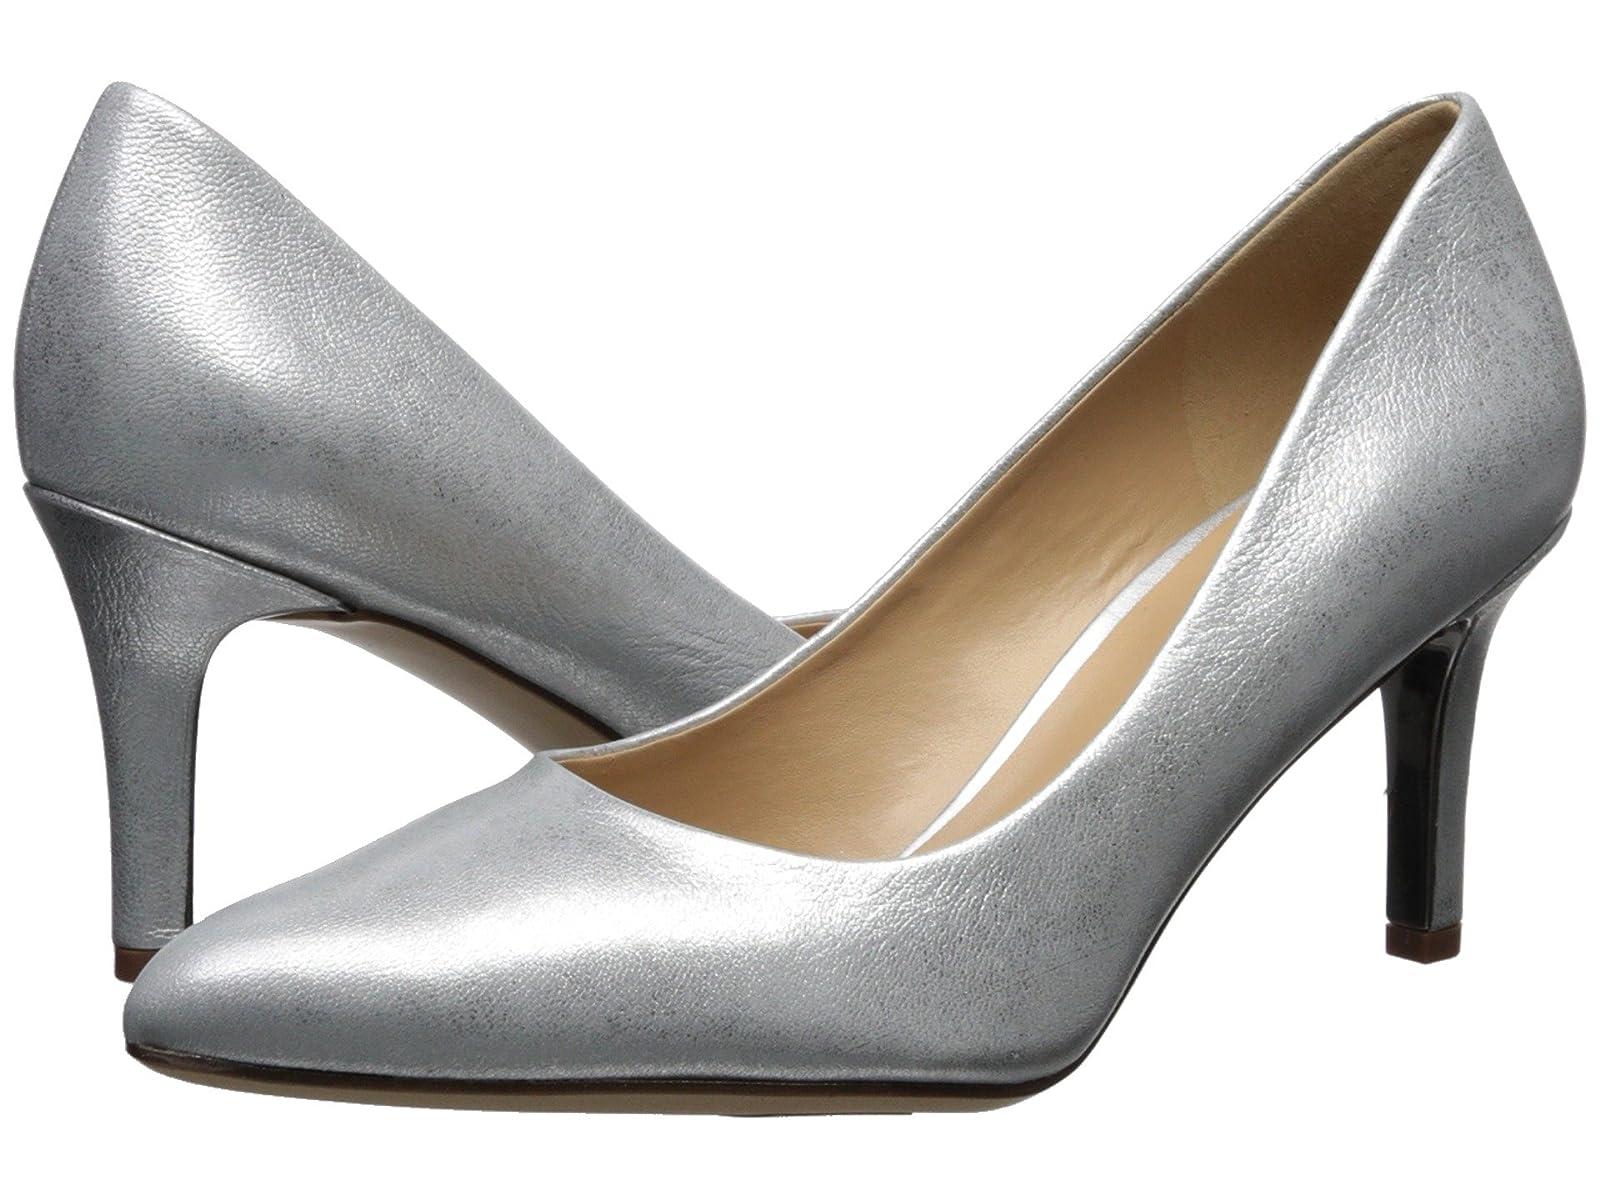 Naturalizer NatalieCheap and distinctive eye-catching shoes